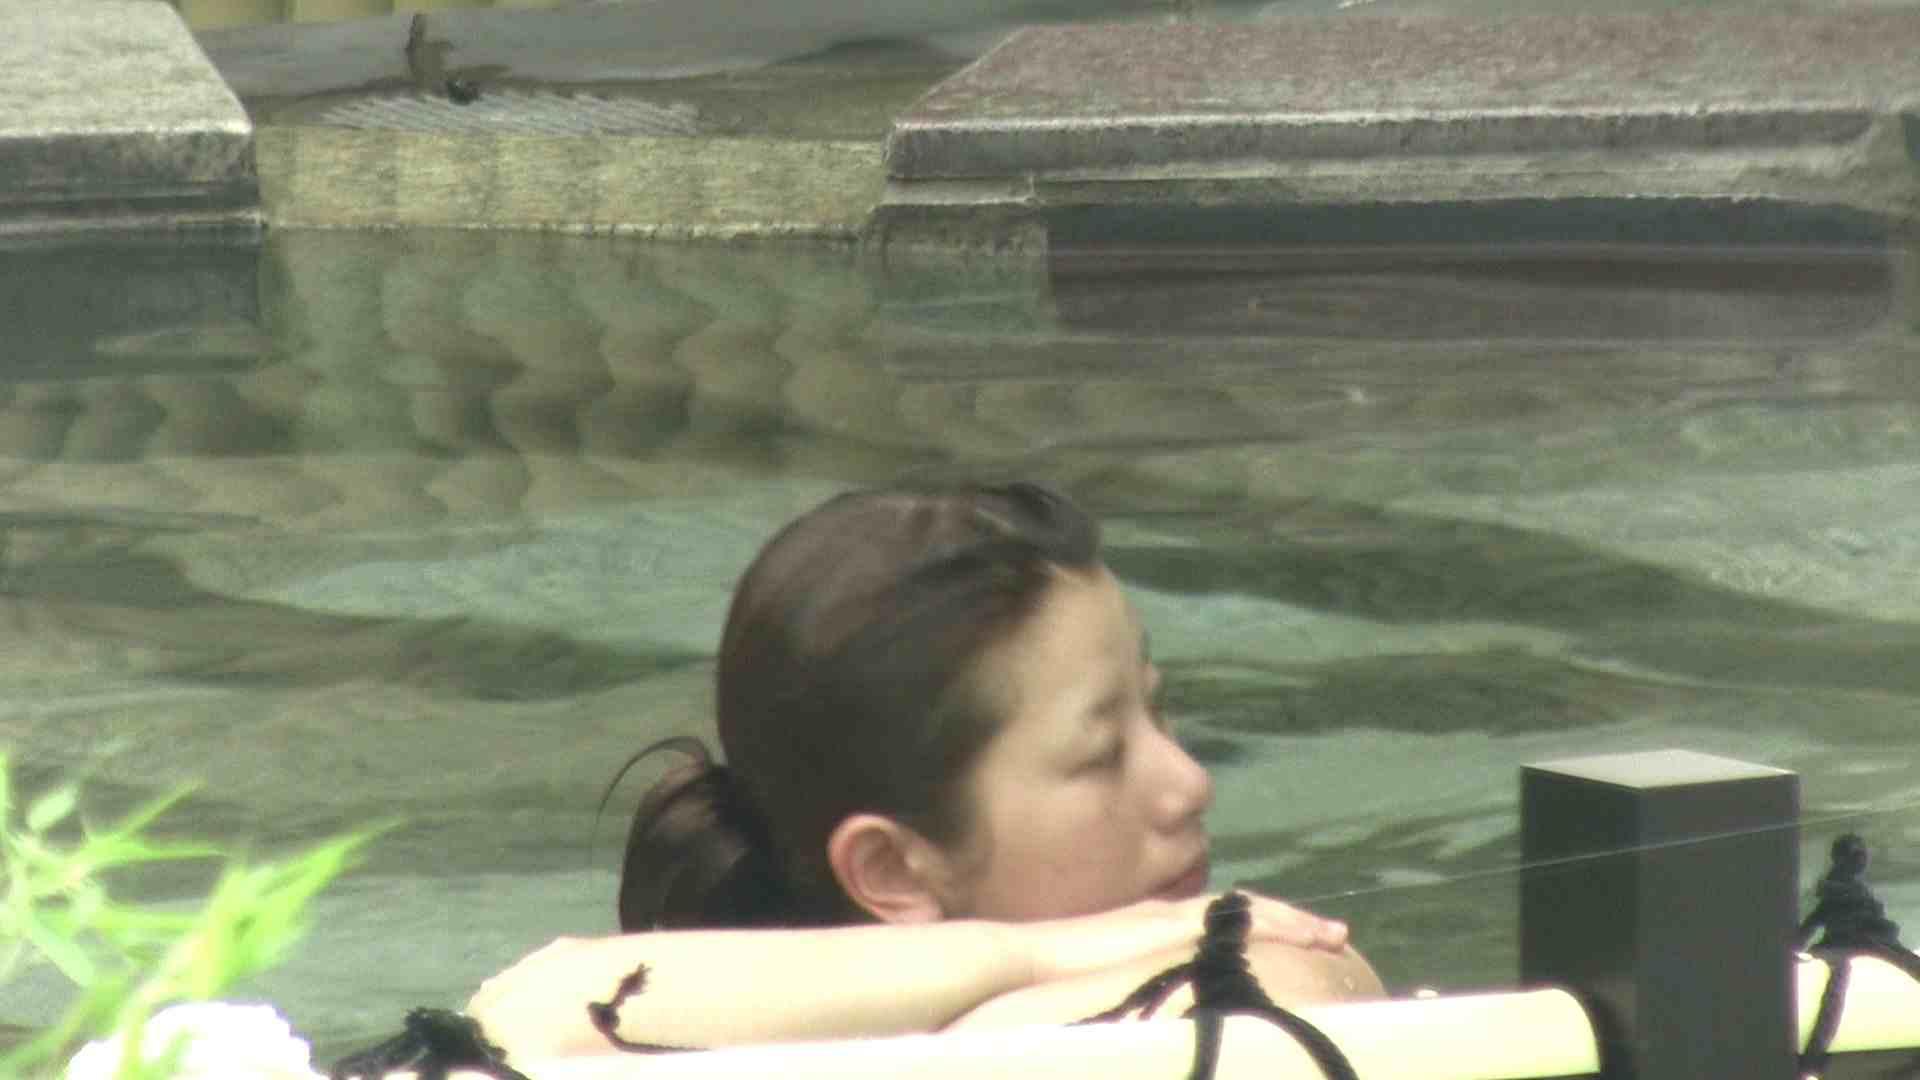 Aquaな露天風呂Vol.19【VIP】 盗撮 | HなOL  88pic 21